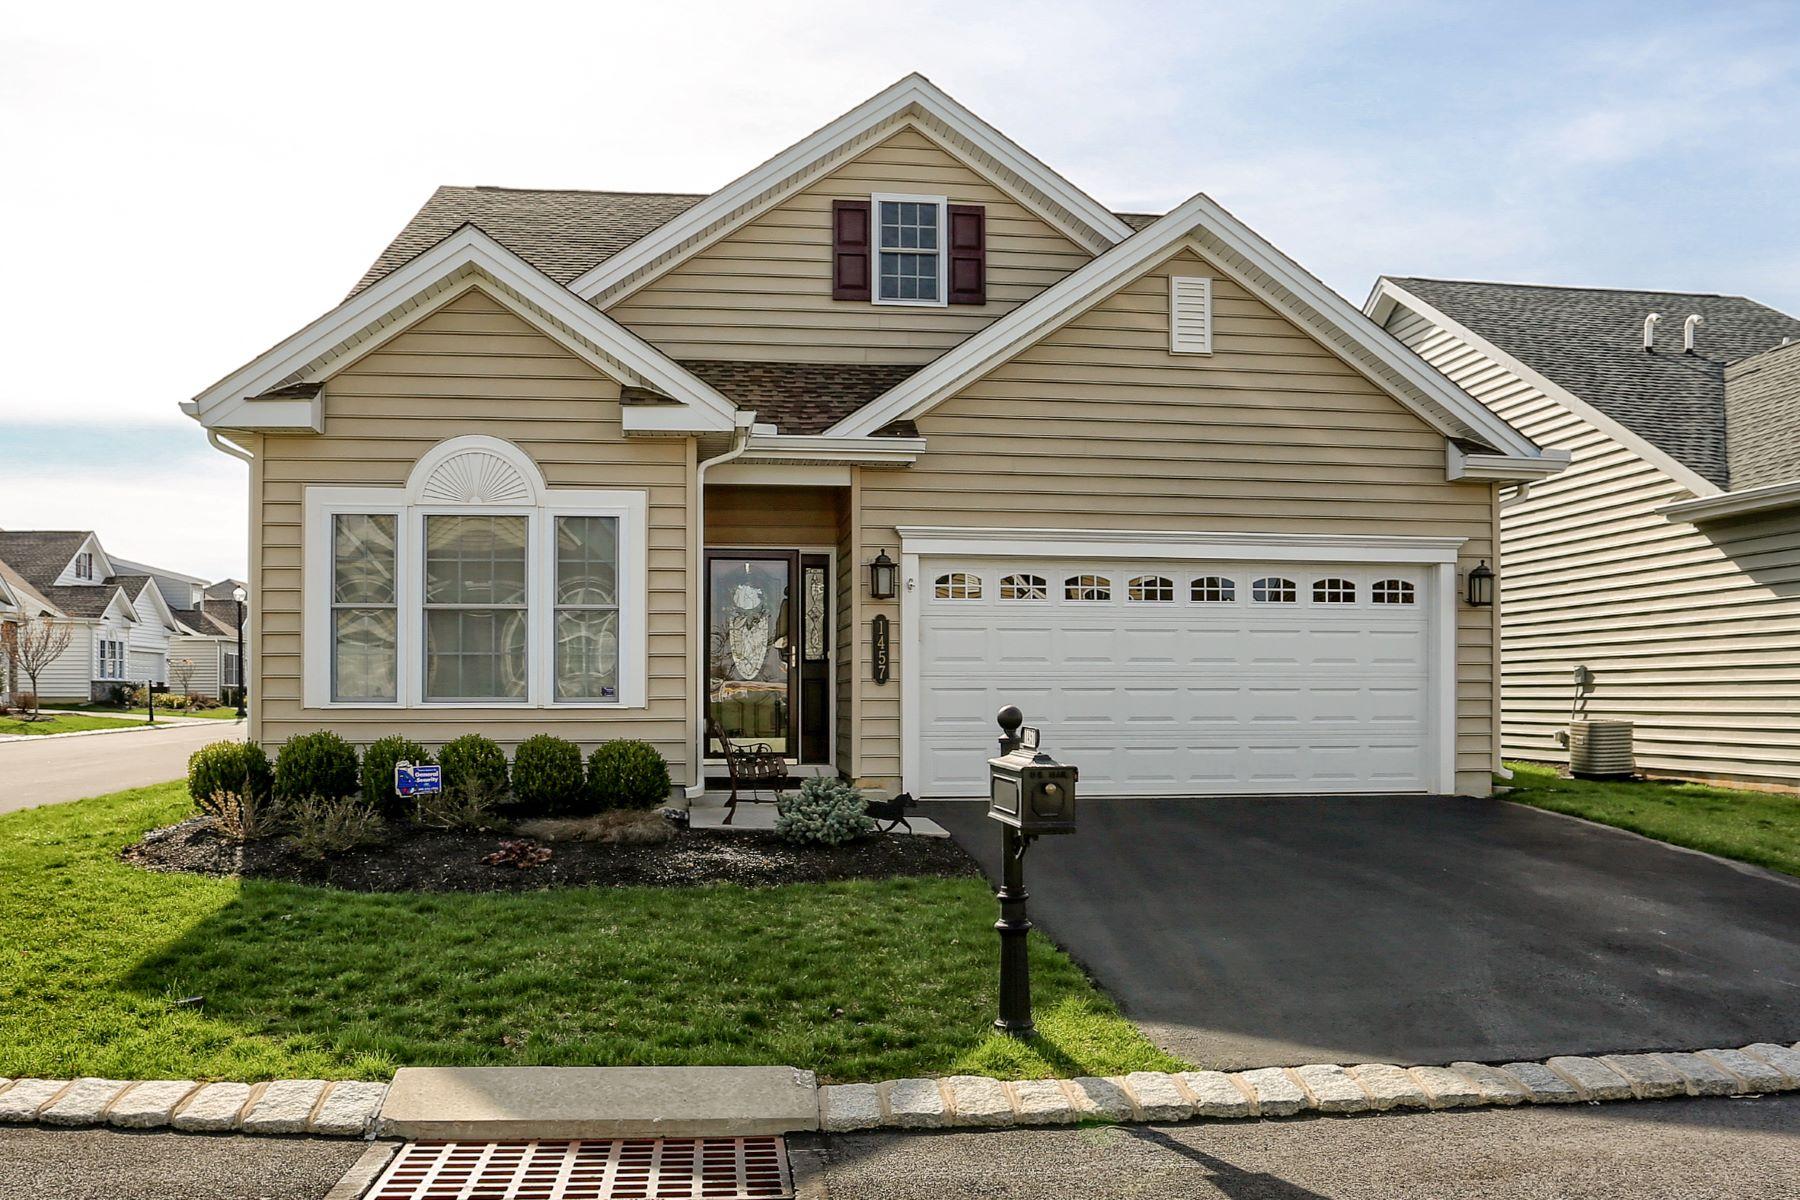 Condominium for Sale at 1457 Emerson Drive Mount Joy, Pennsylvania 17552 United States